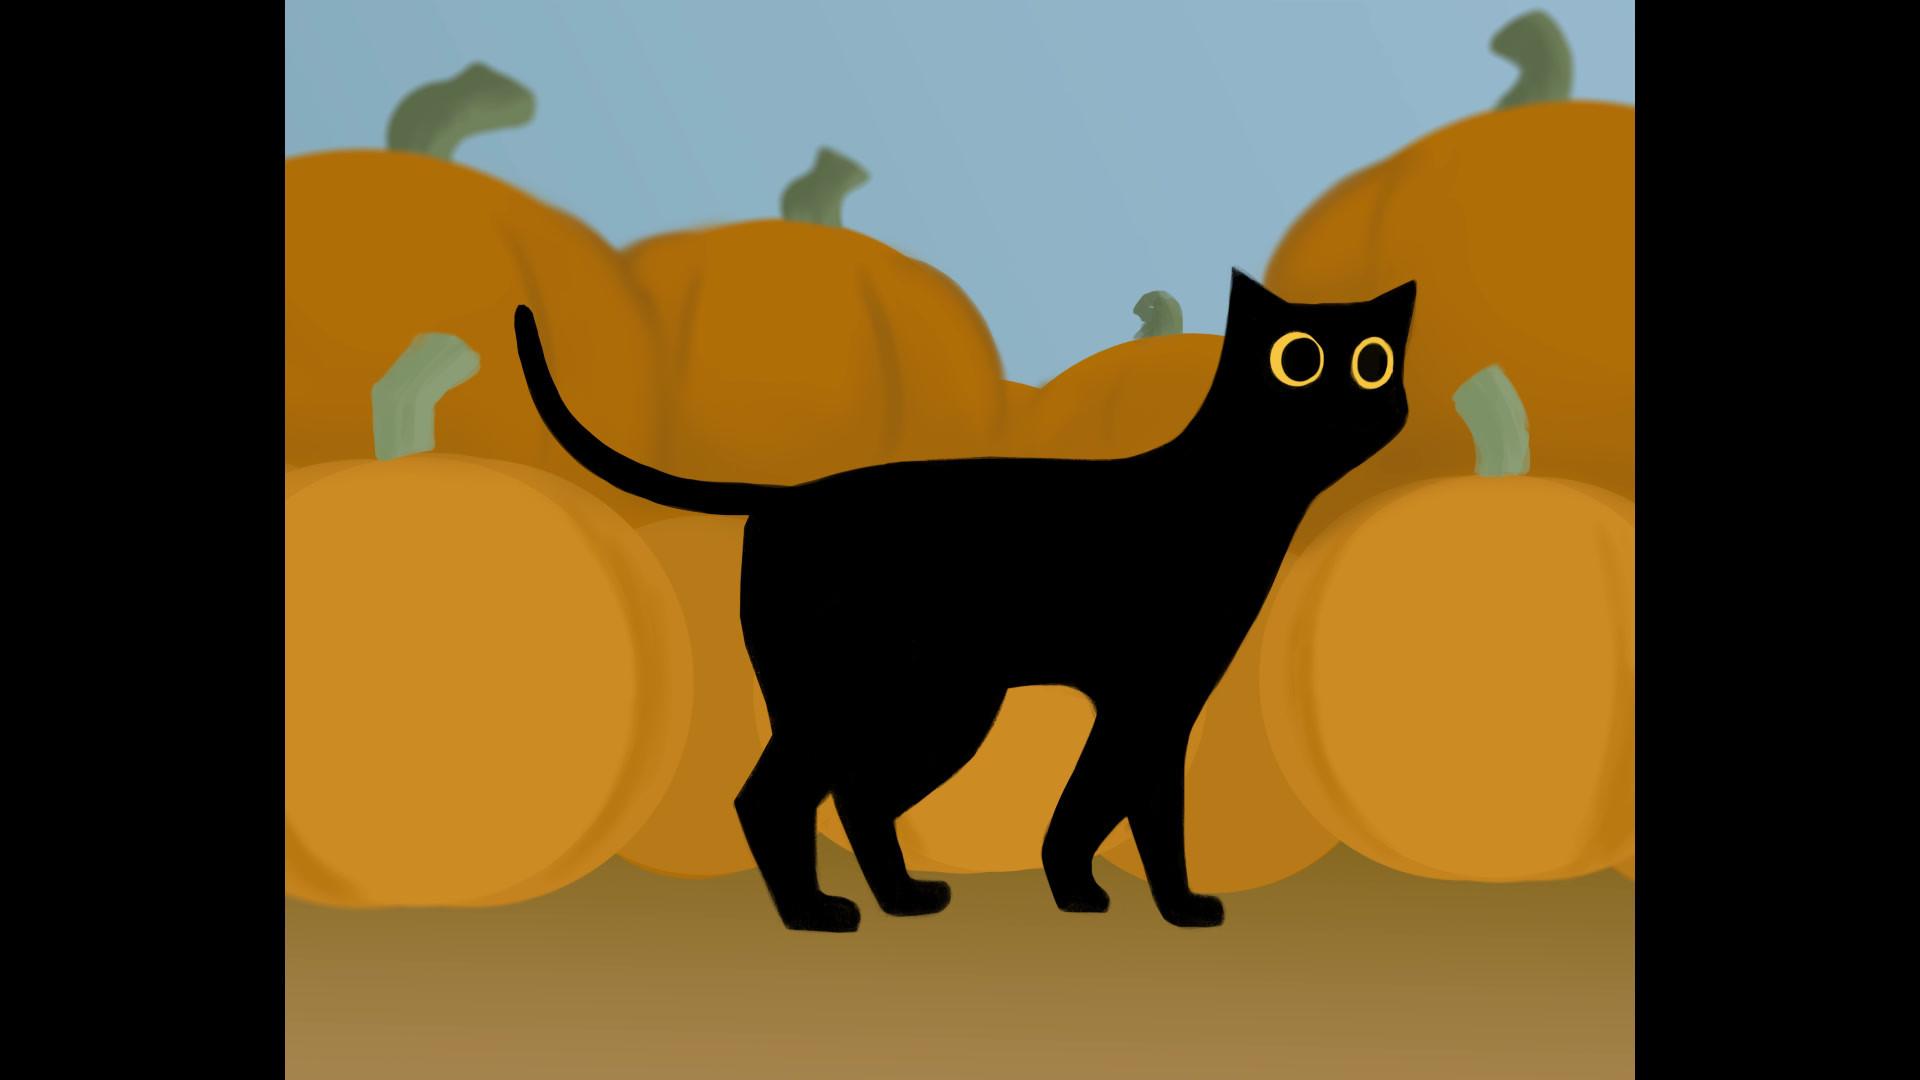 Kitty Cat Animation Test